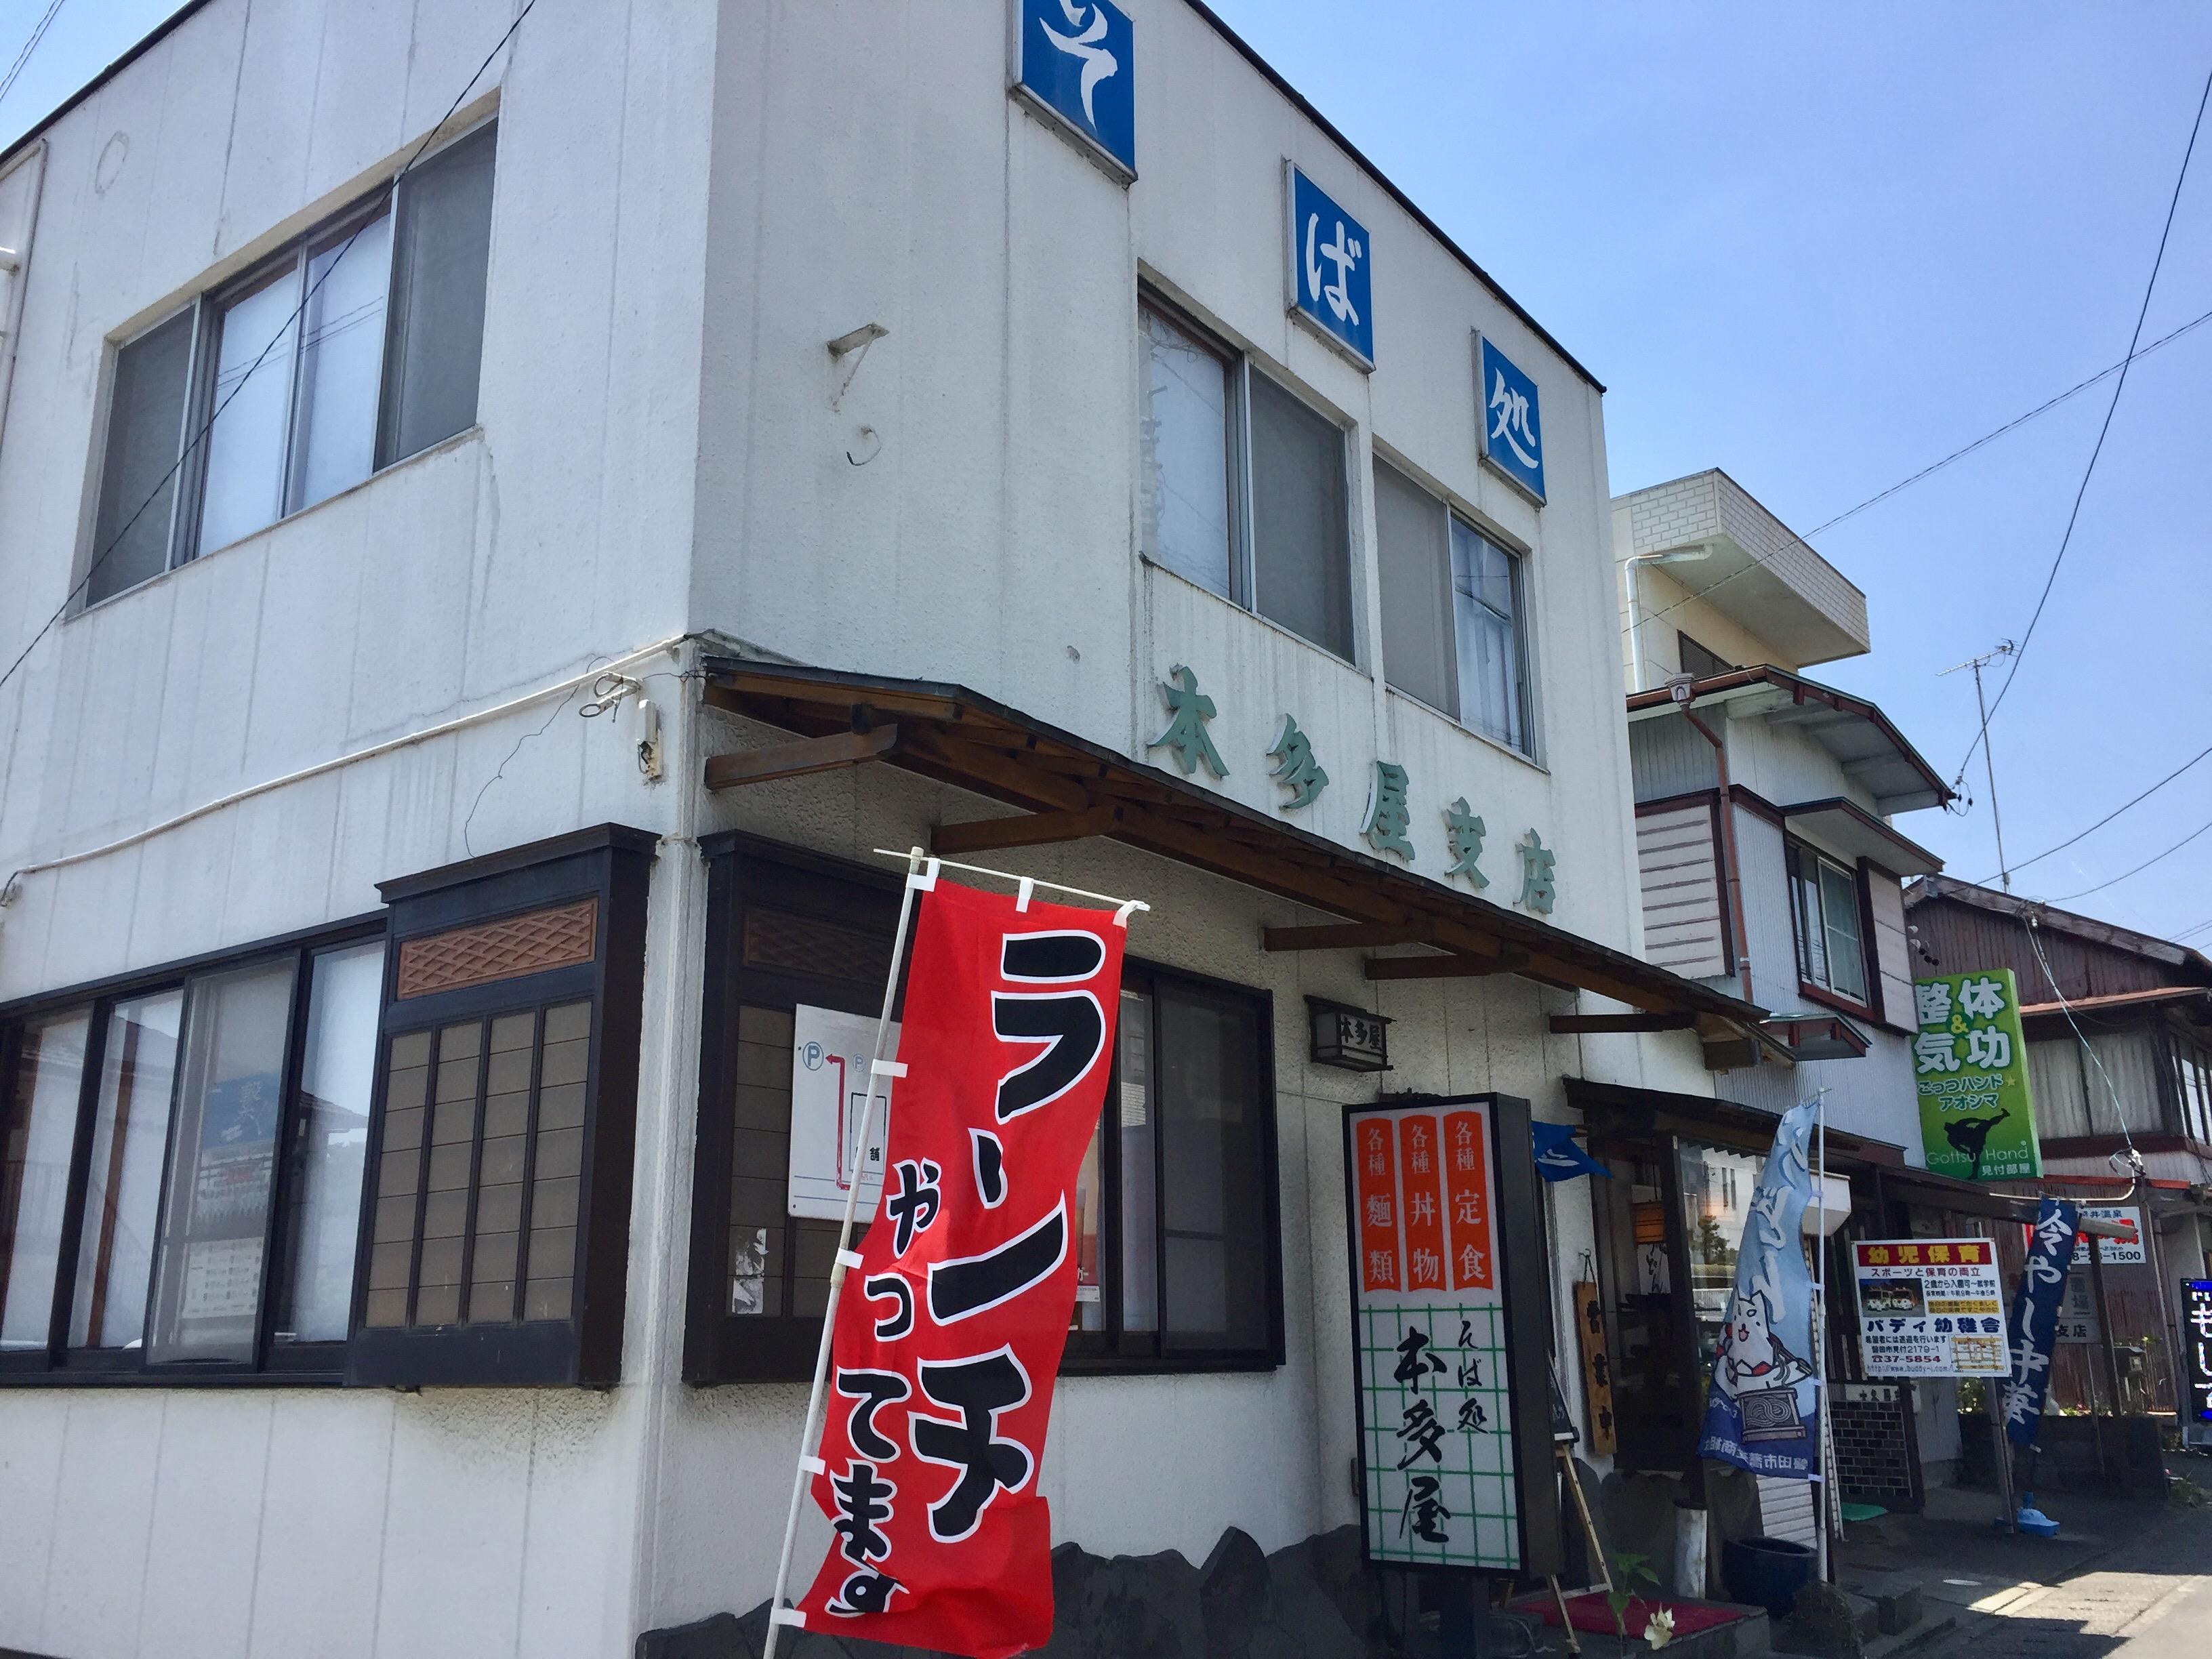 磐田 ランチ 本多屋支店(見付店)